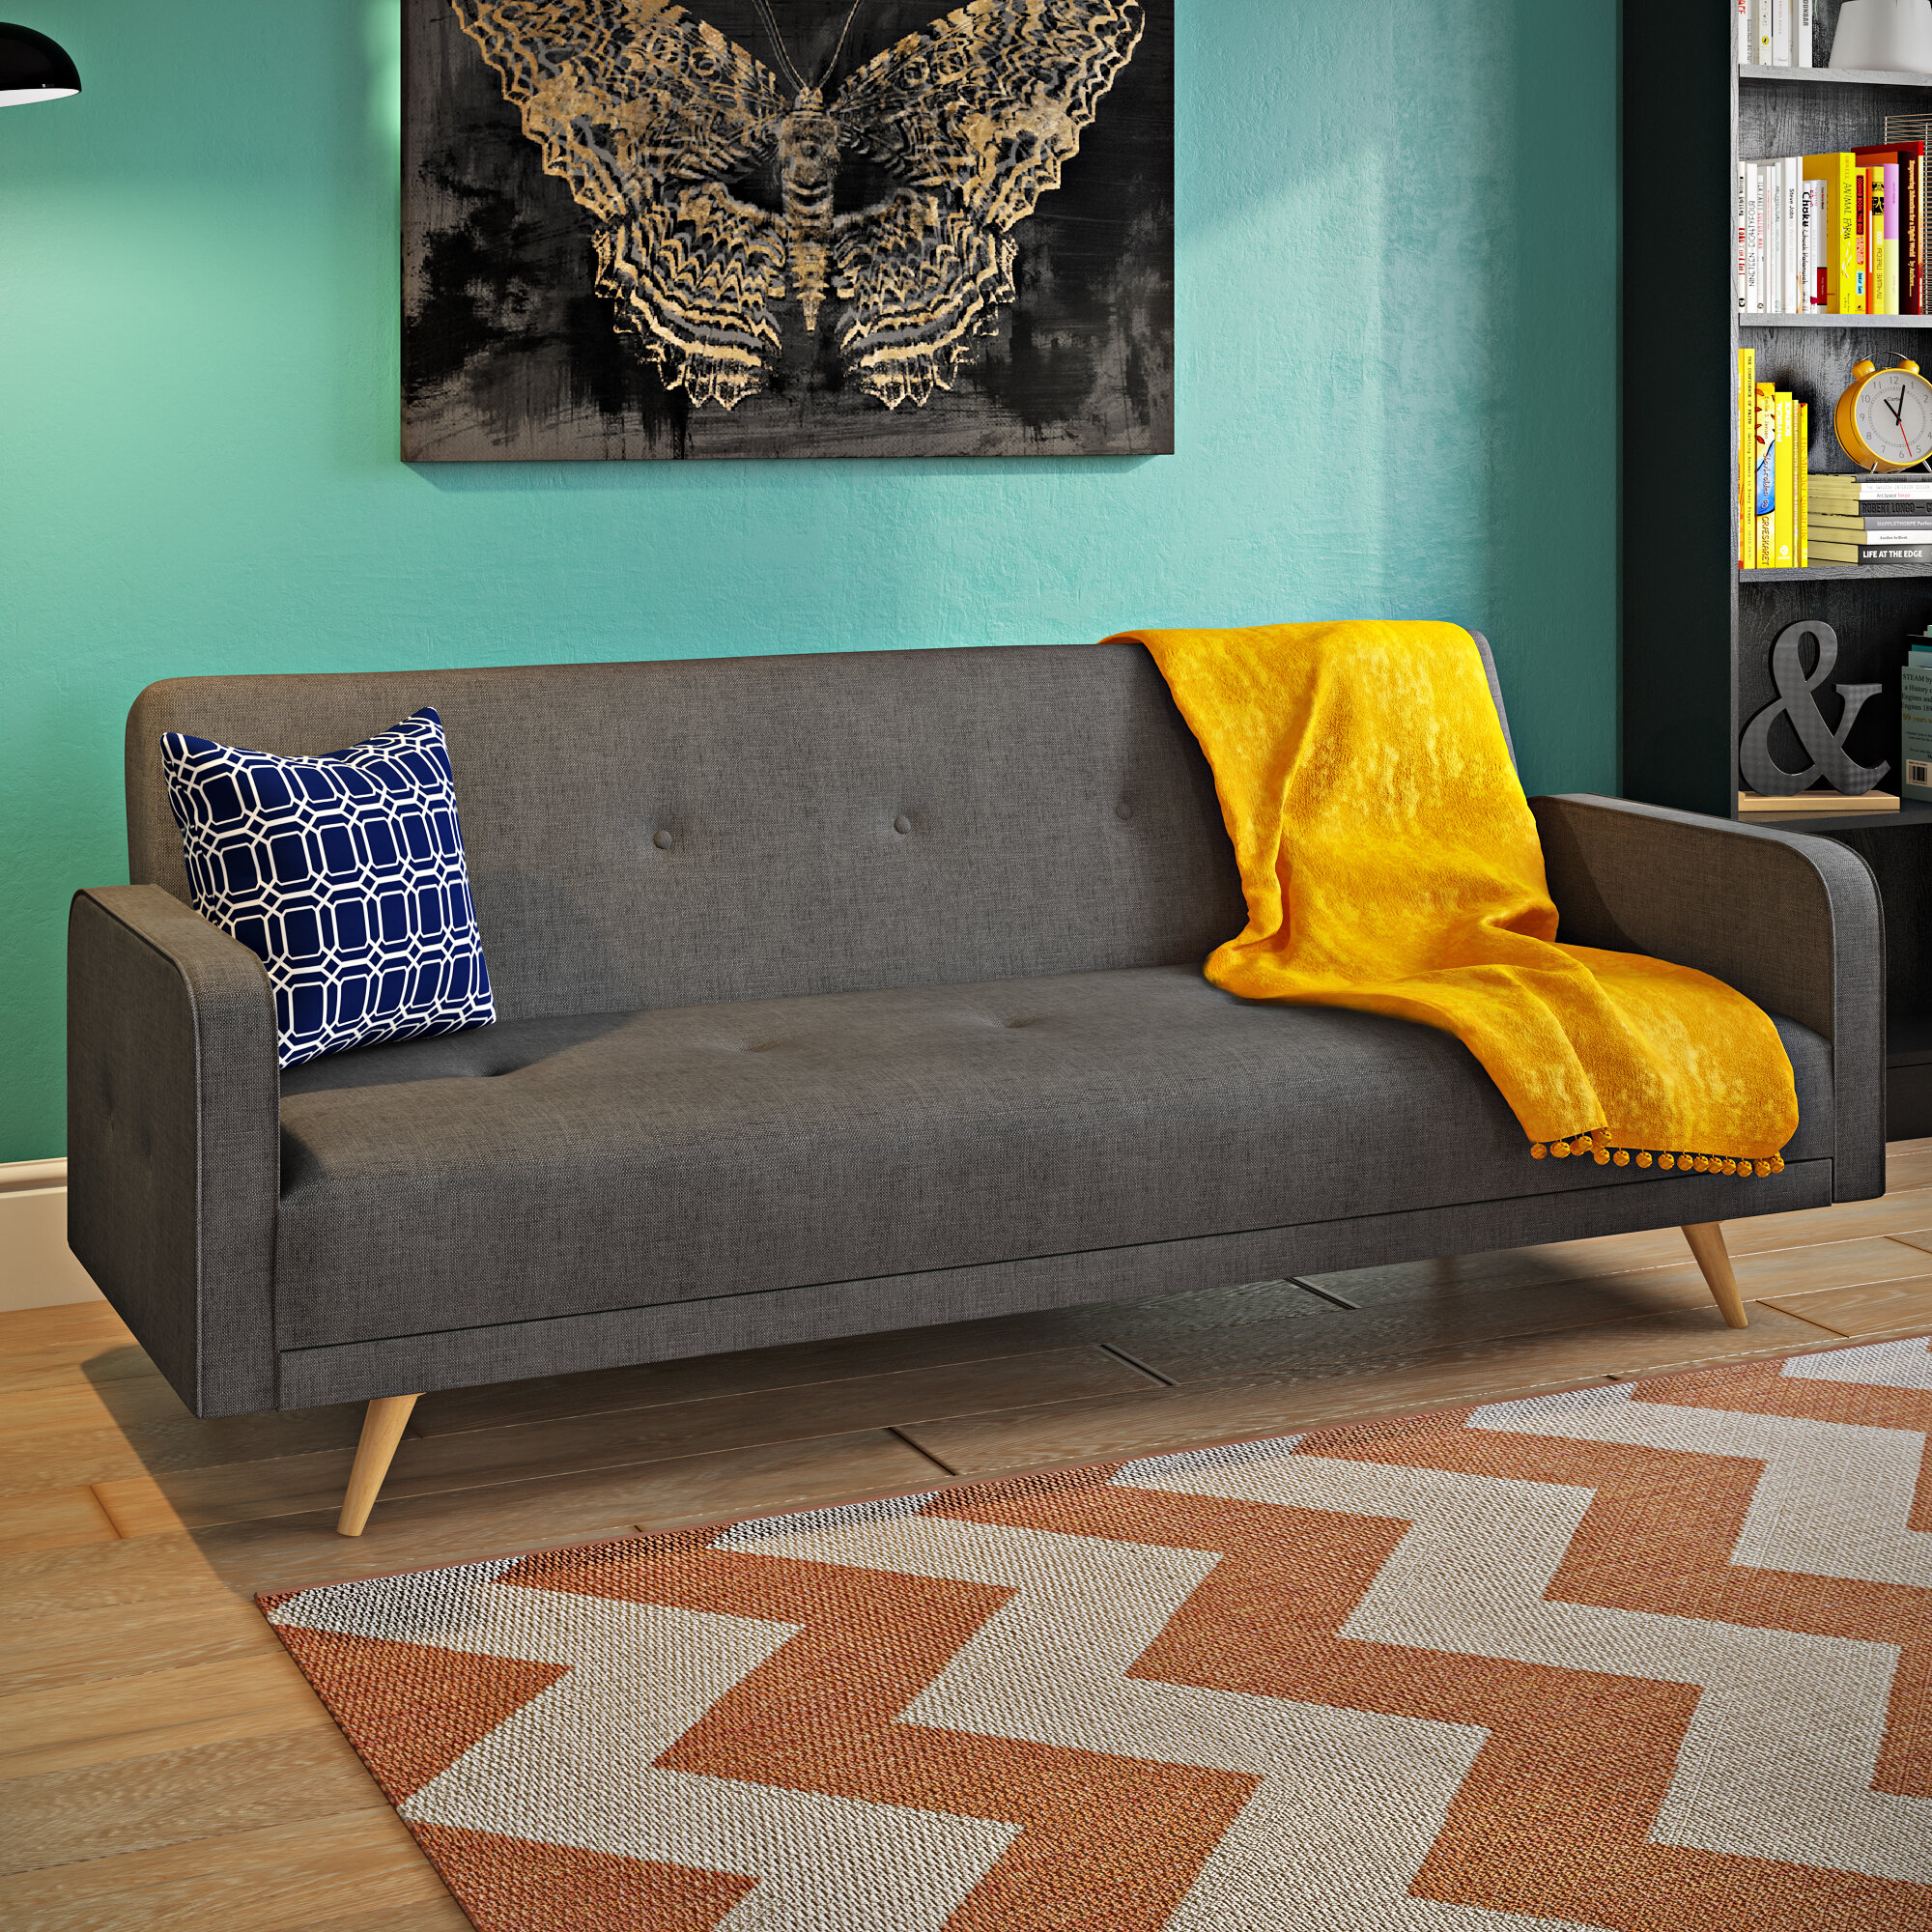 Mercury Row Patro 3 Seater Clic Clac Sofa Bed & Reviews